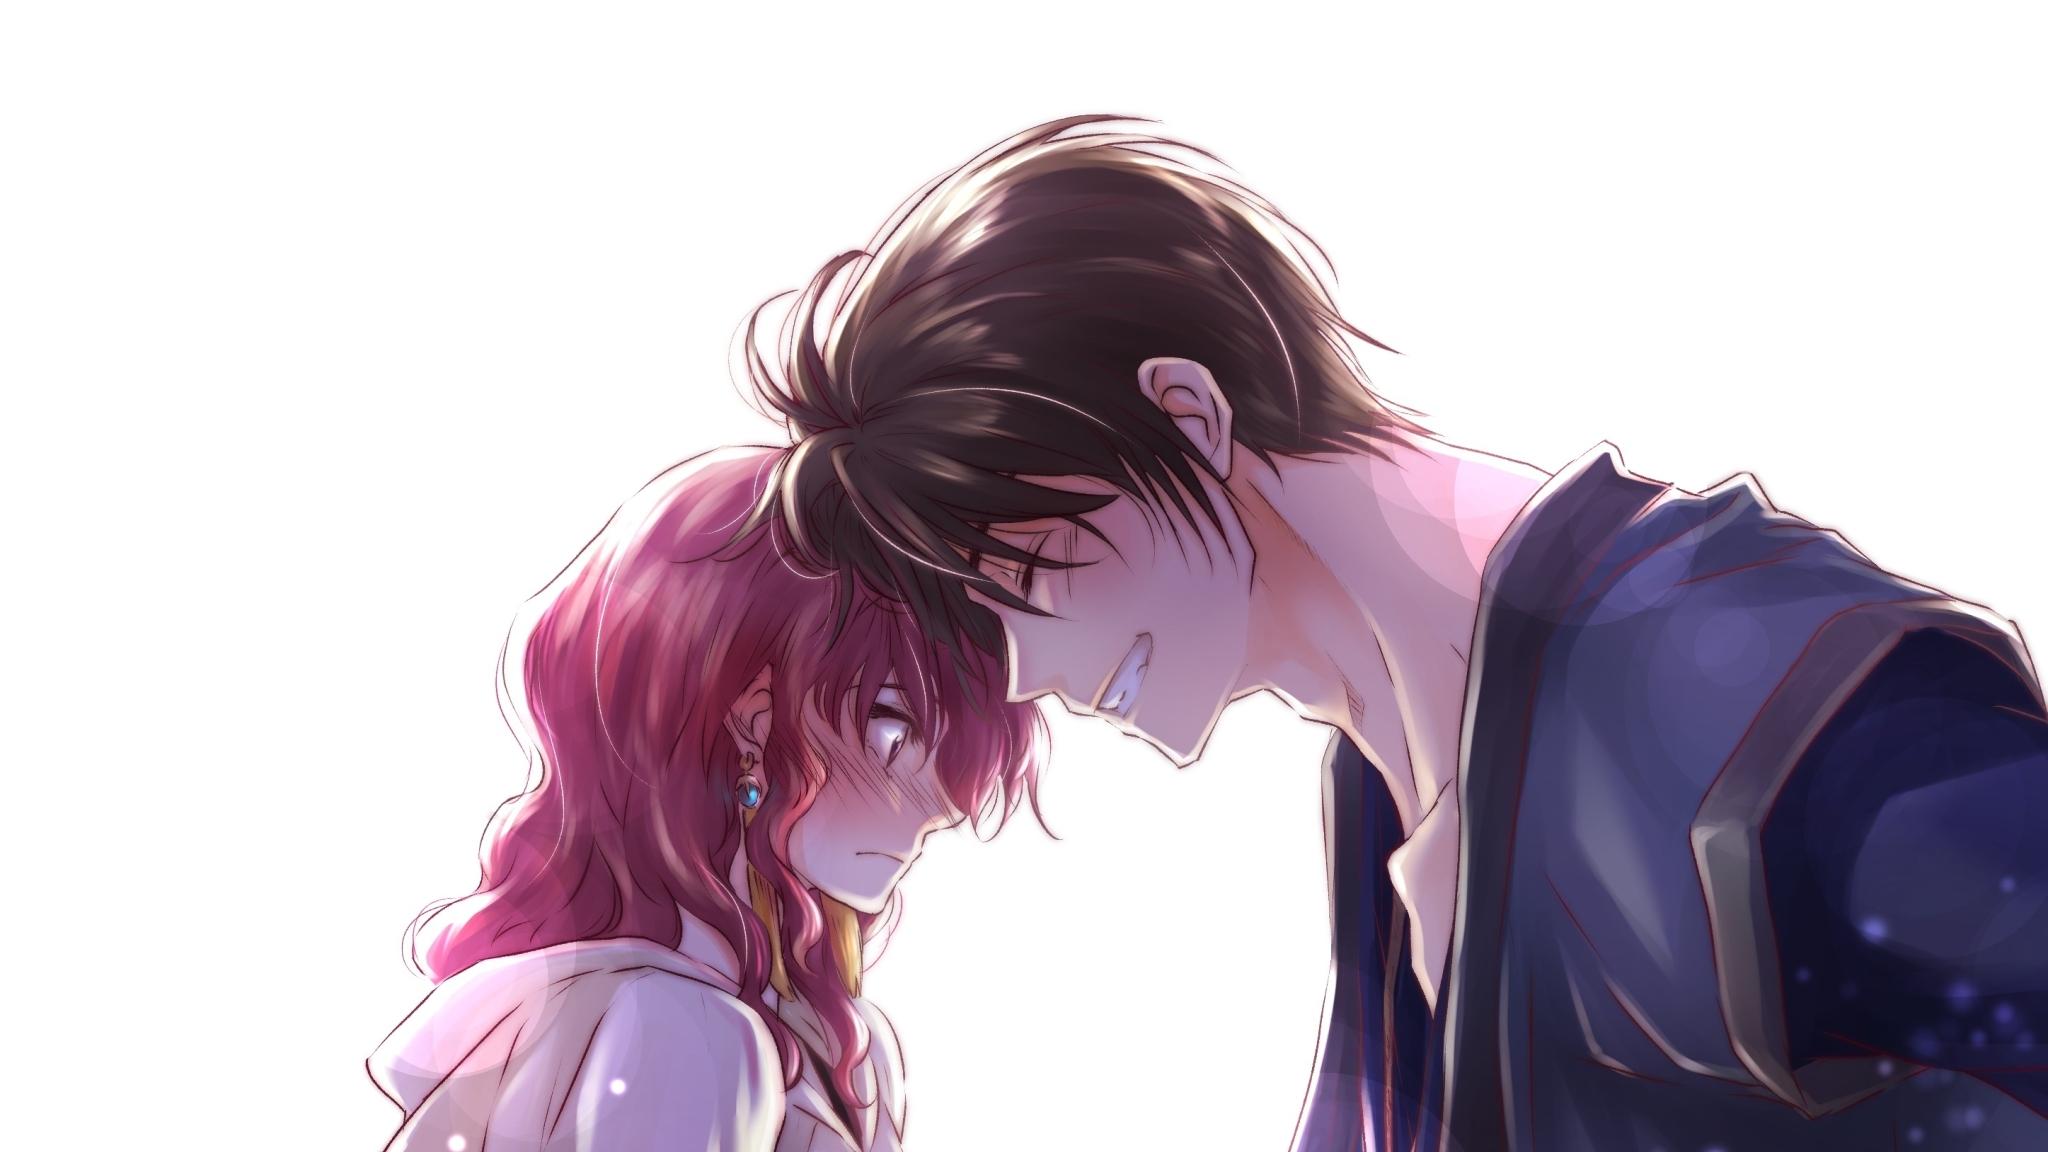 2048x1152 Anime Yona Of The Dawn 2048x1152 Resolution